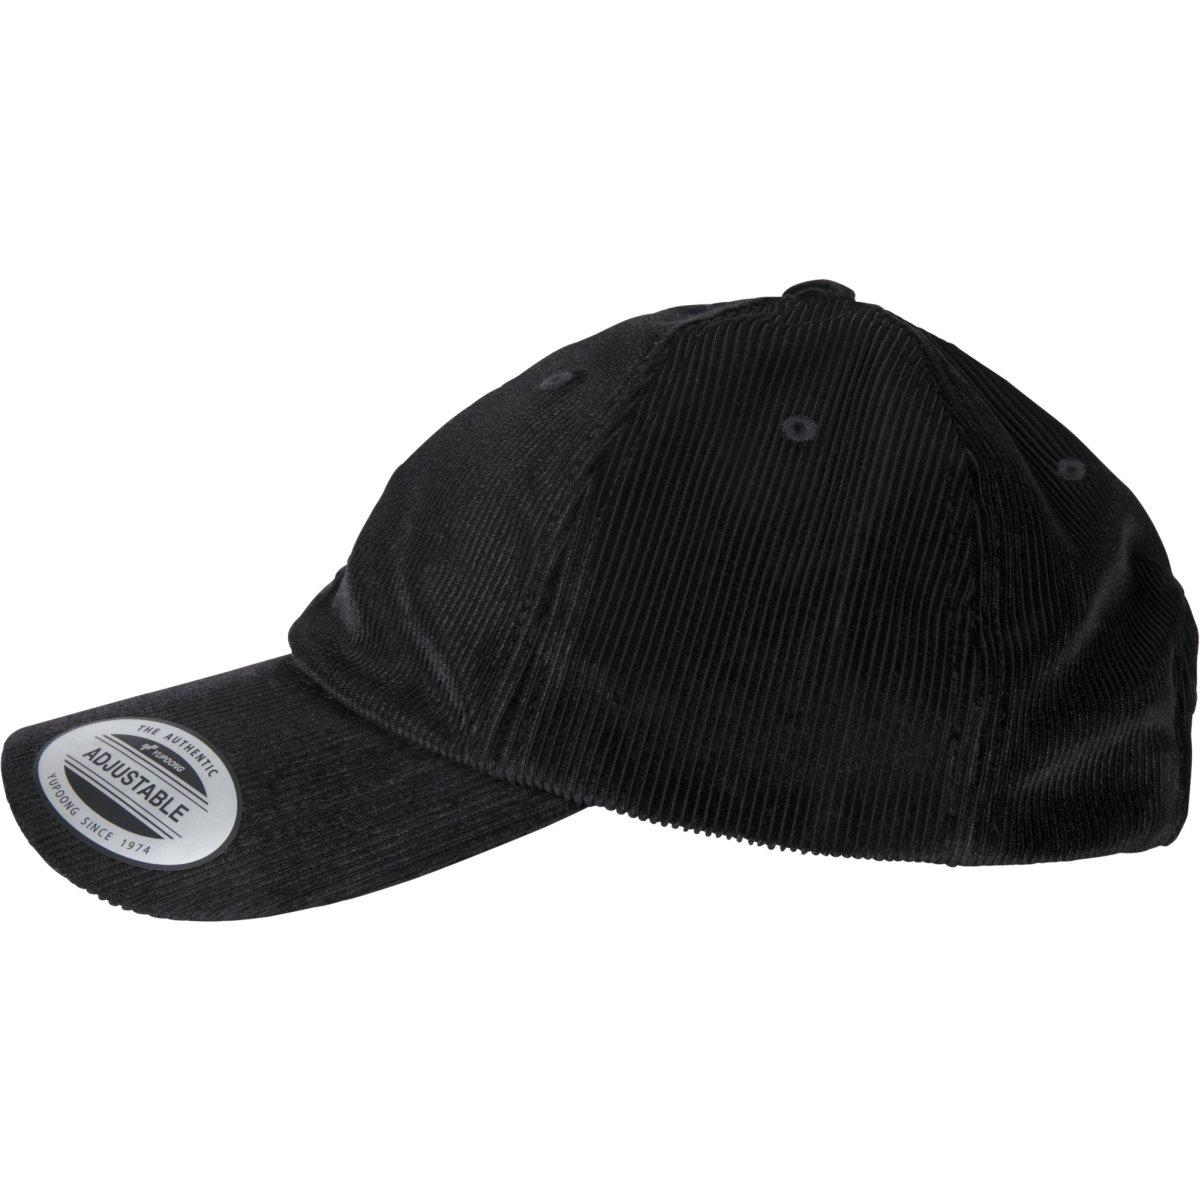 514ae591fdf Flexfit LOW PROFILE Corduroy SATIN Dad Cap - One Size